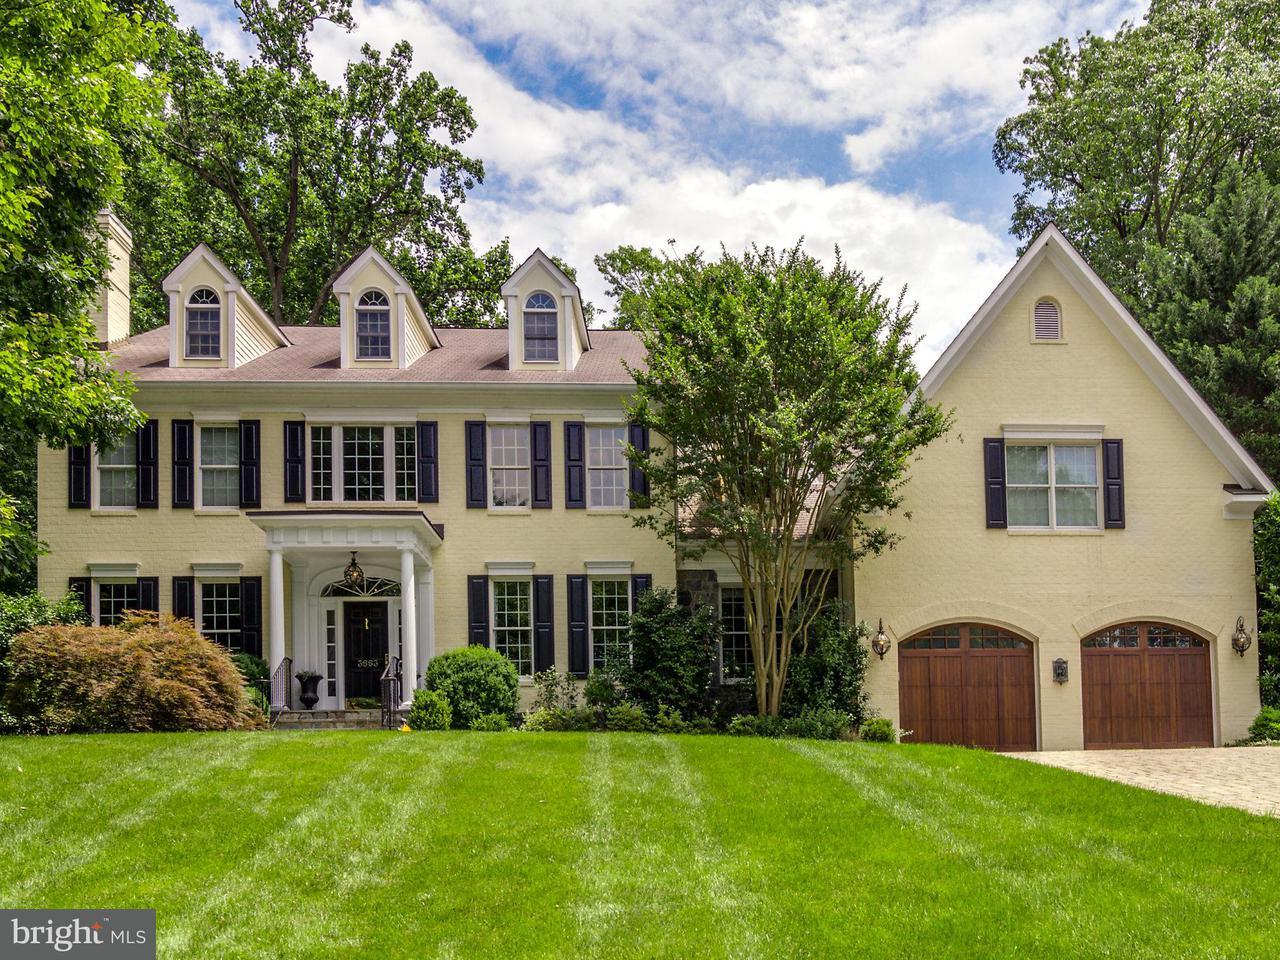 Single Family Home for Sale at 3663 N Monroe St N 3663 N Monroe St N Arlington, Virginia 22207 United States